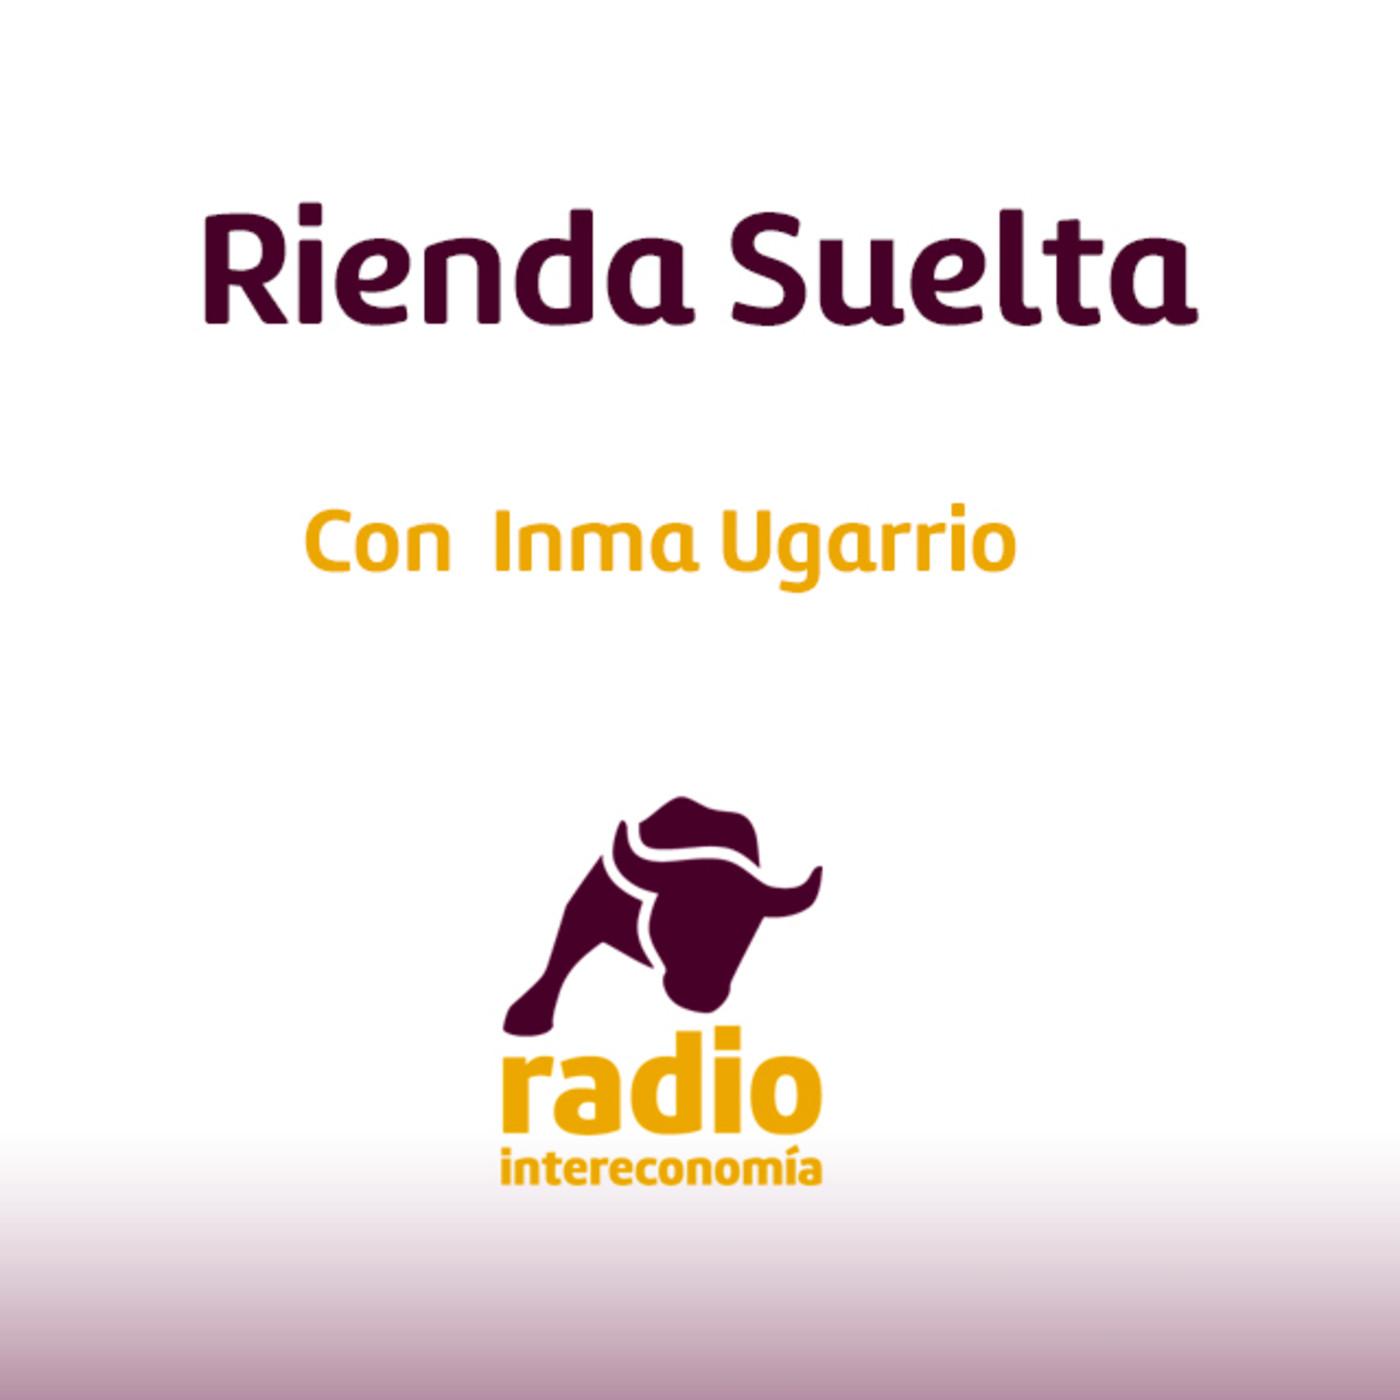 Escucha Rienda Suelta - iVoox